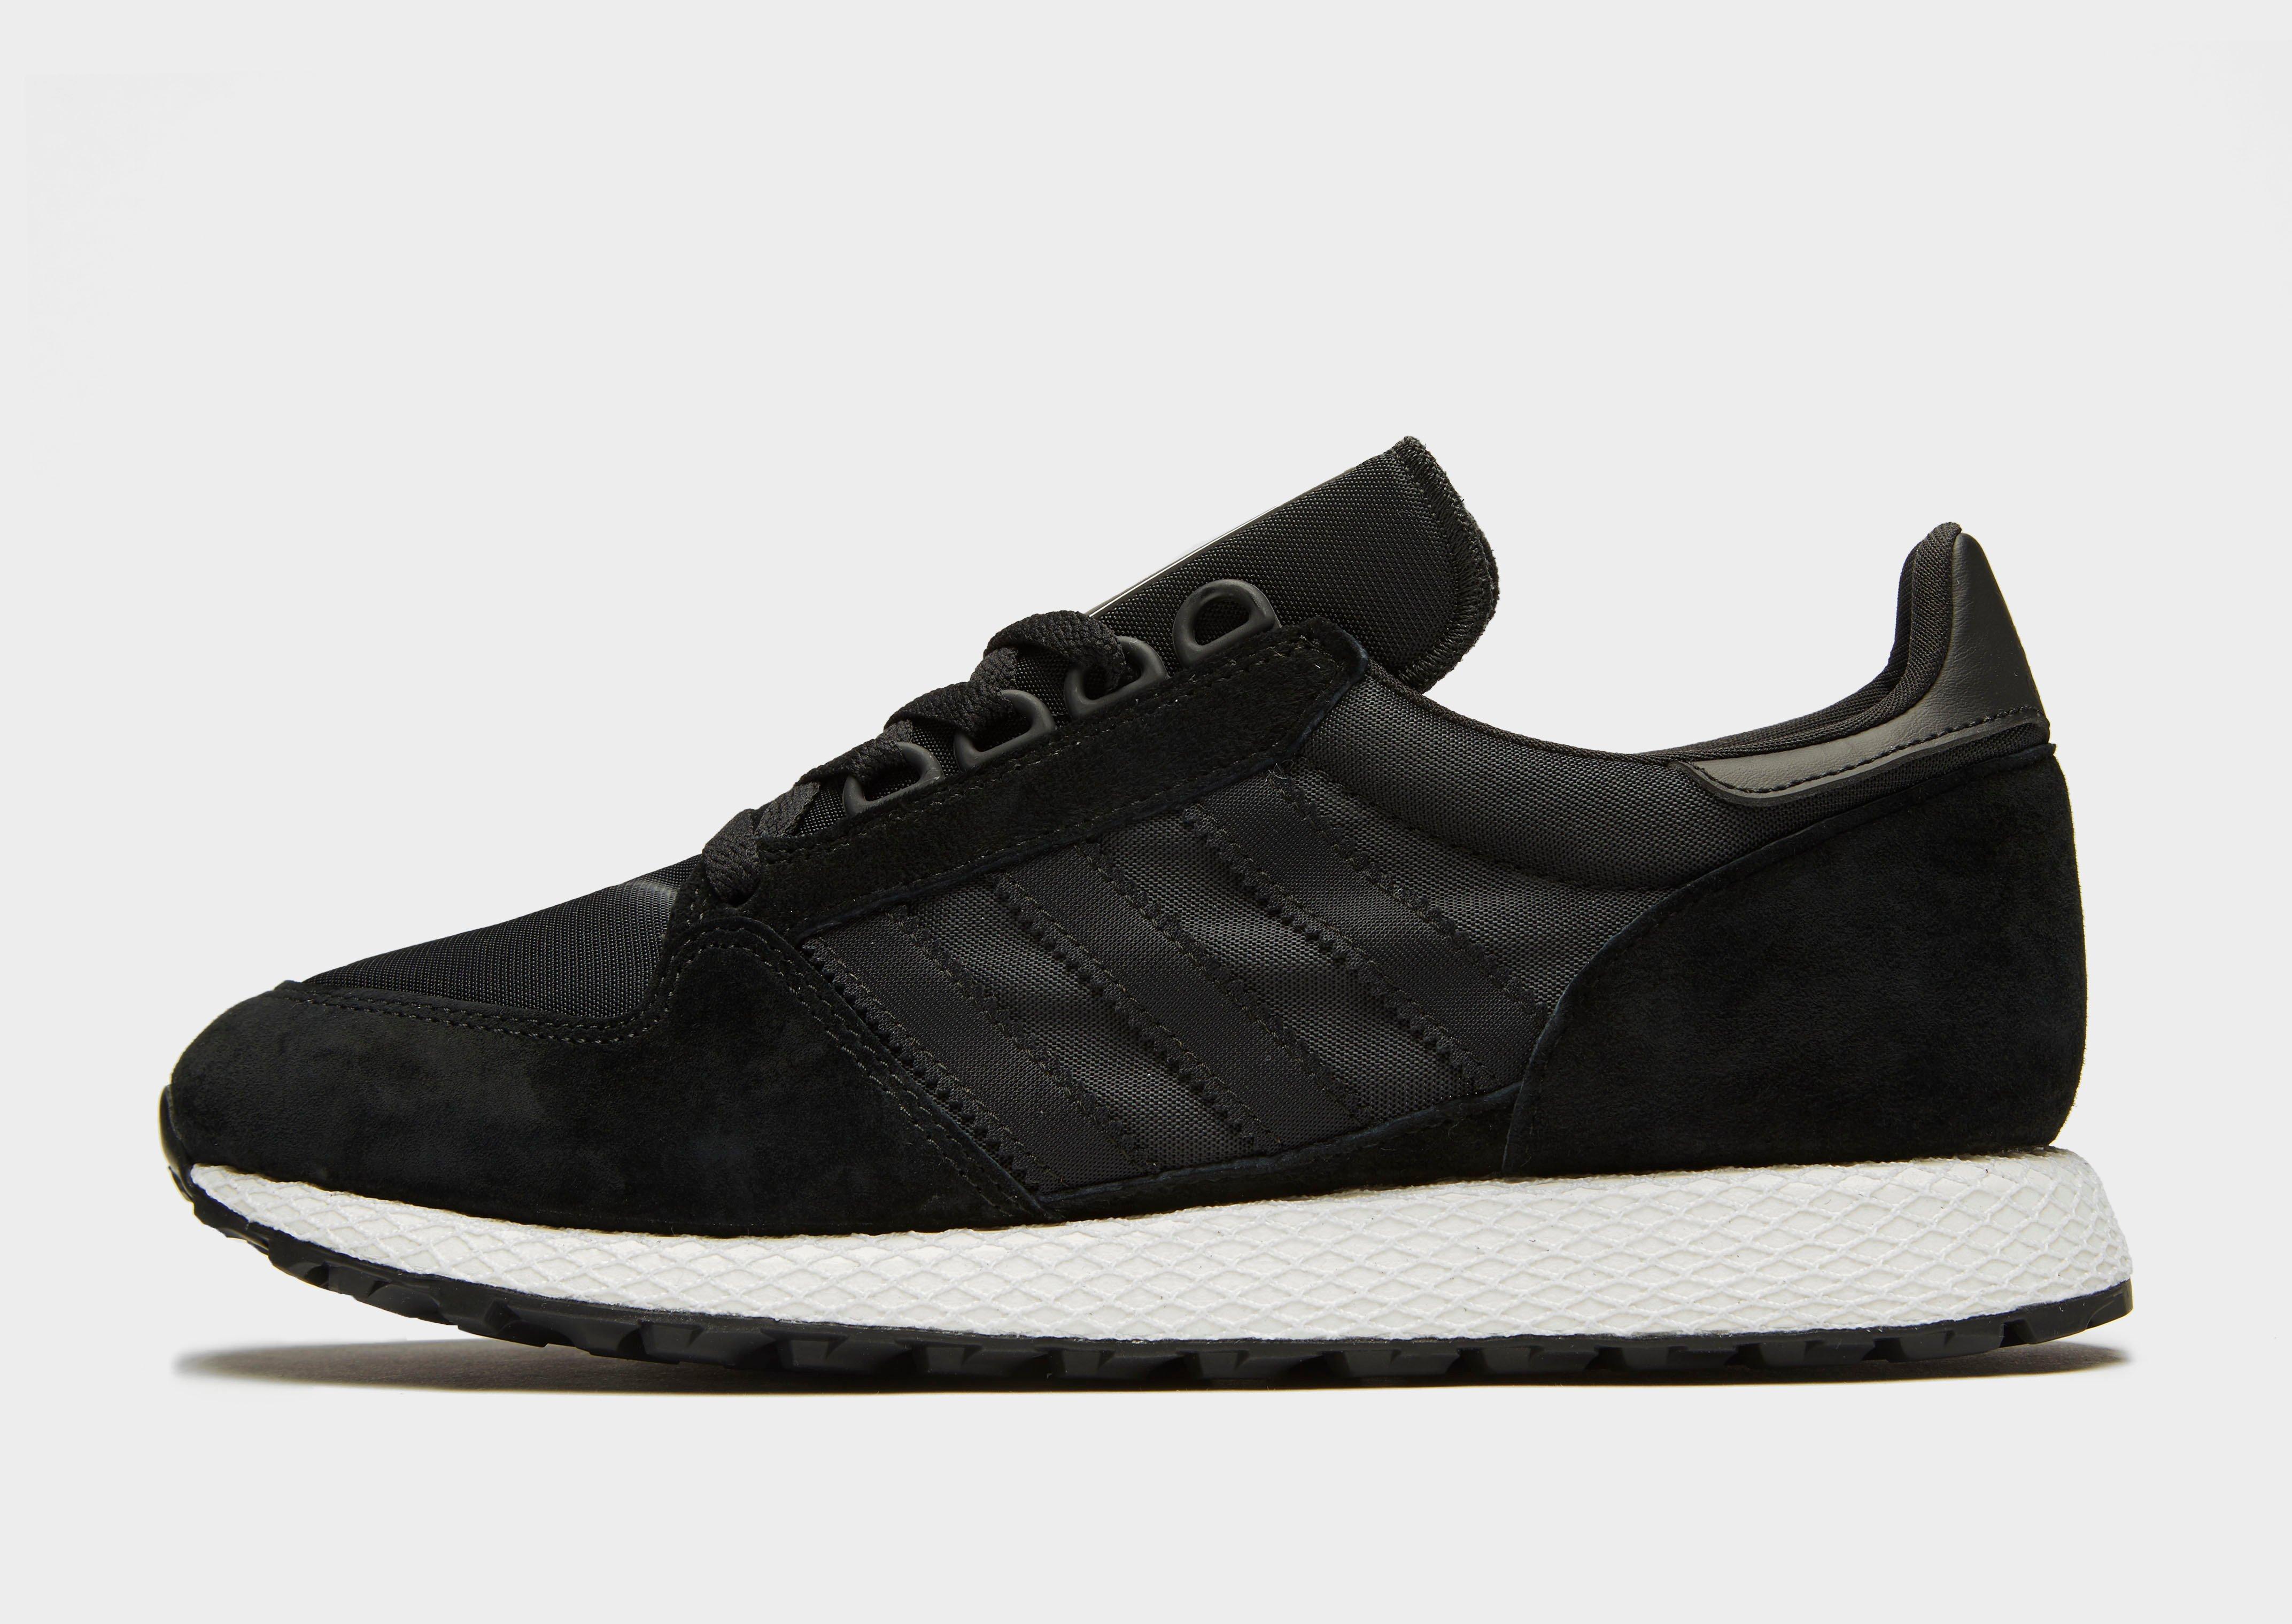 newest de7c2 cc7d3 adidas Originals Forest Grove in Black for Men - Lyst